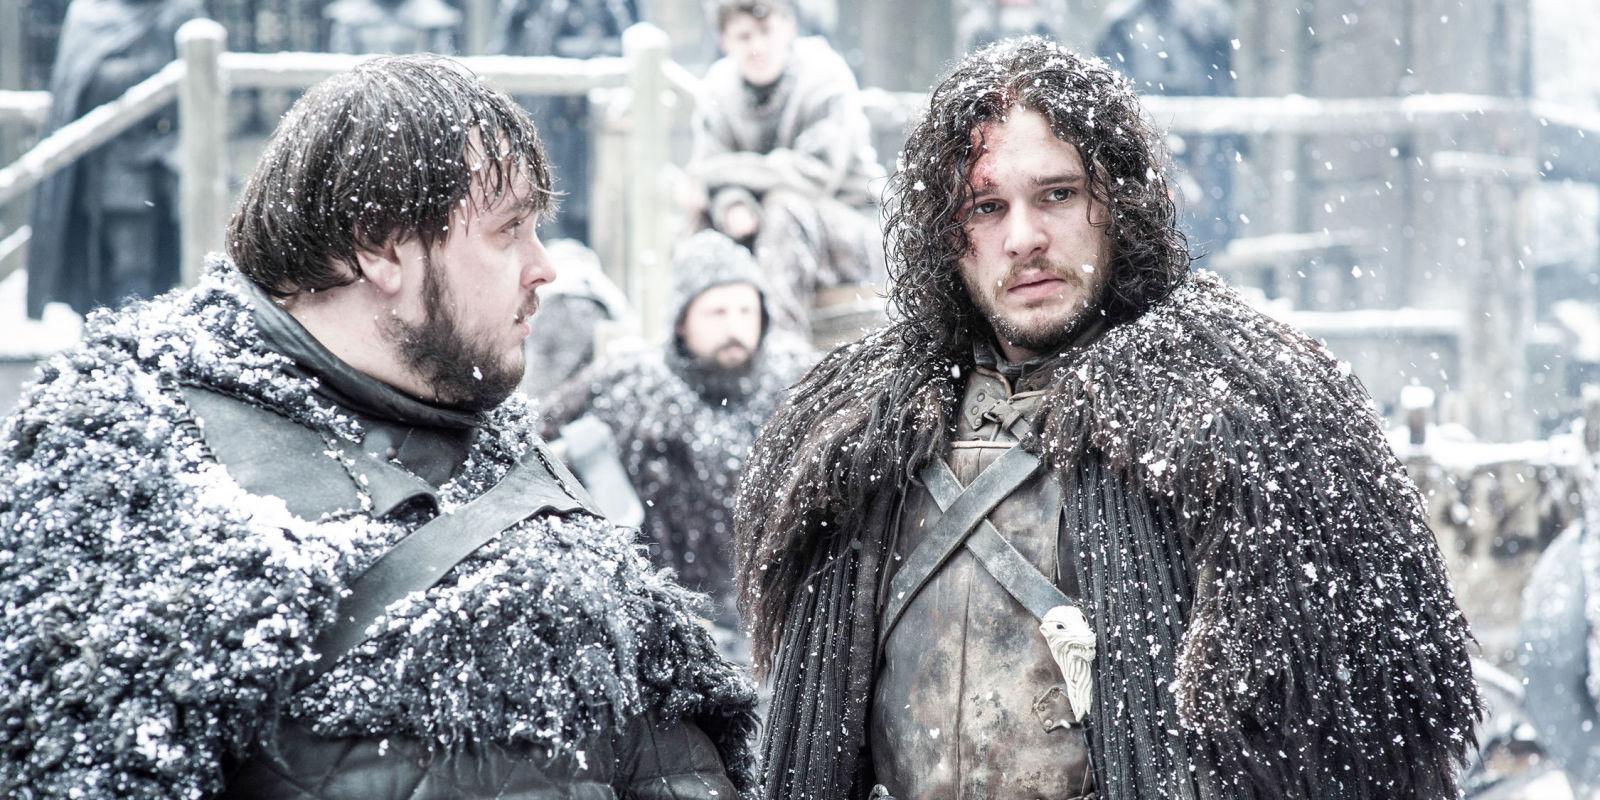 Game Of Thrones Star John Bradley Gives A Heartfelt